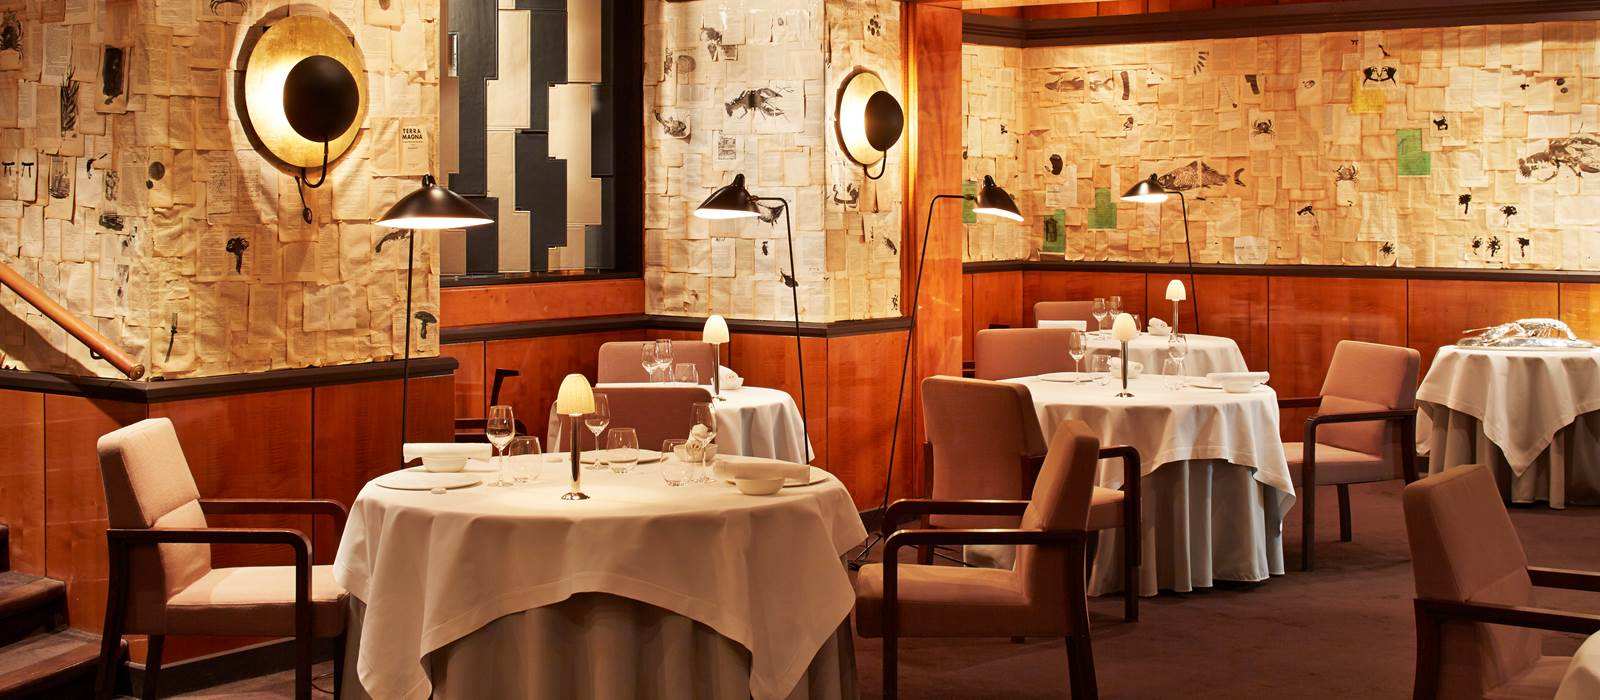 Pierre Gagnaire Restaurant Hotel Balzac Paris